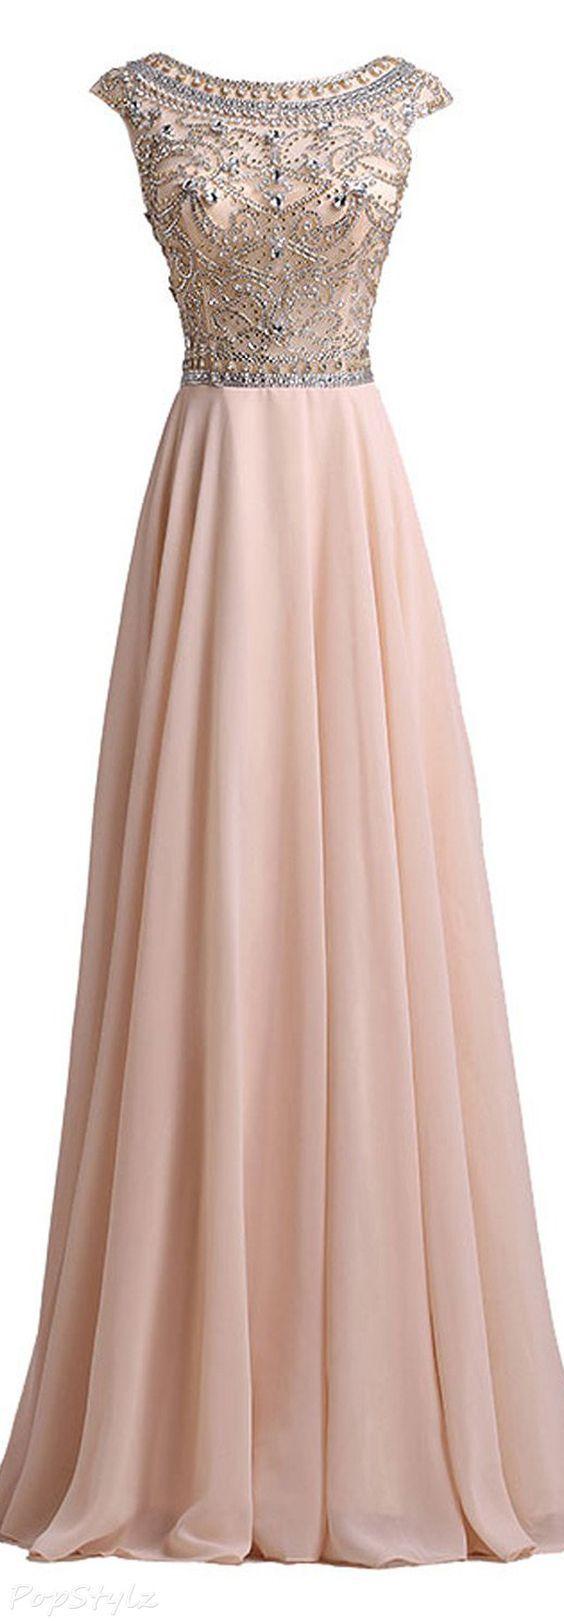 LovingDress Chiffon & Tulle Long Evening Gown | Elegancia ...